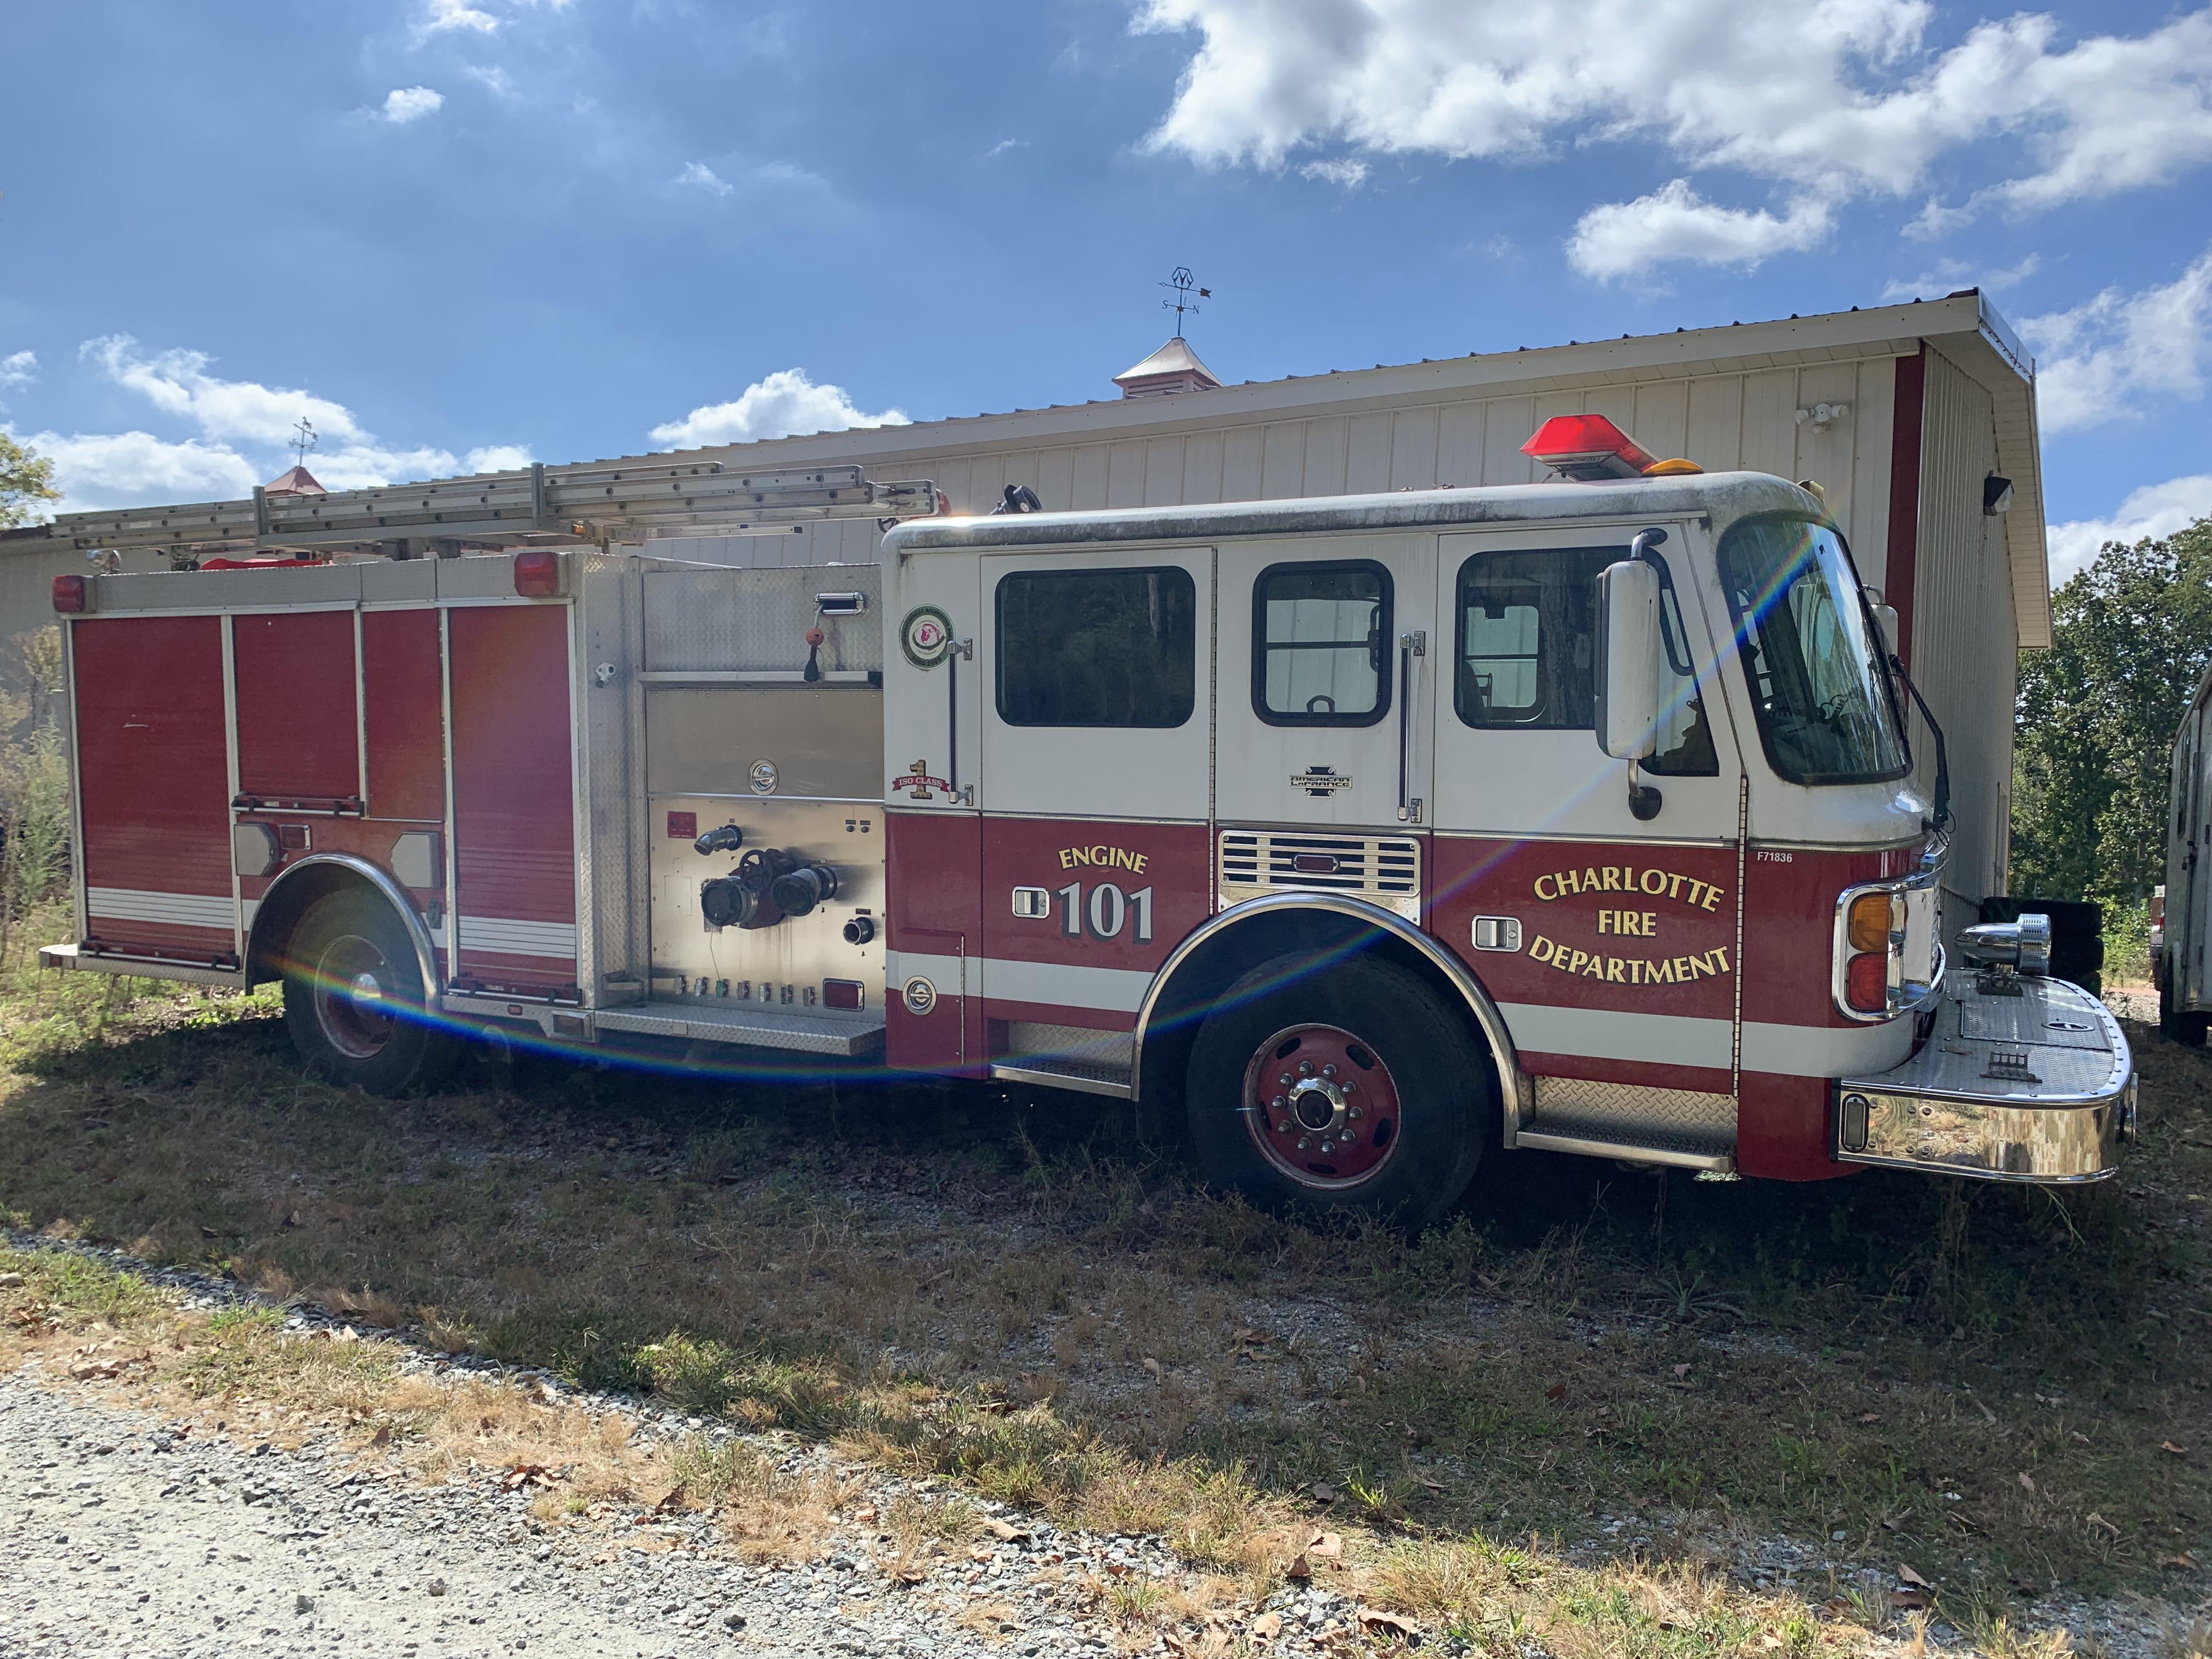 Used, 1998, AMERICAN LAFRANCE, FIRE TRUCK, Ambulance